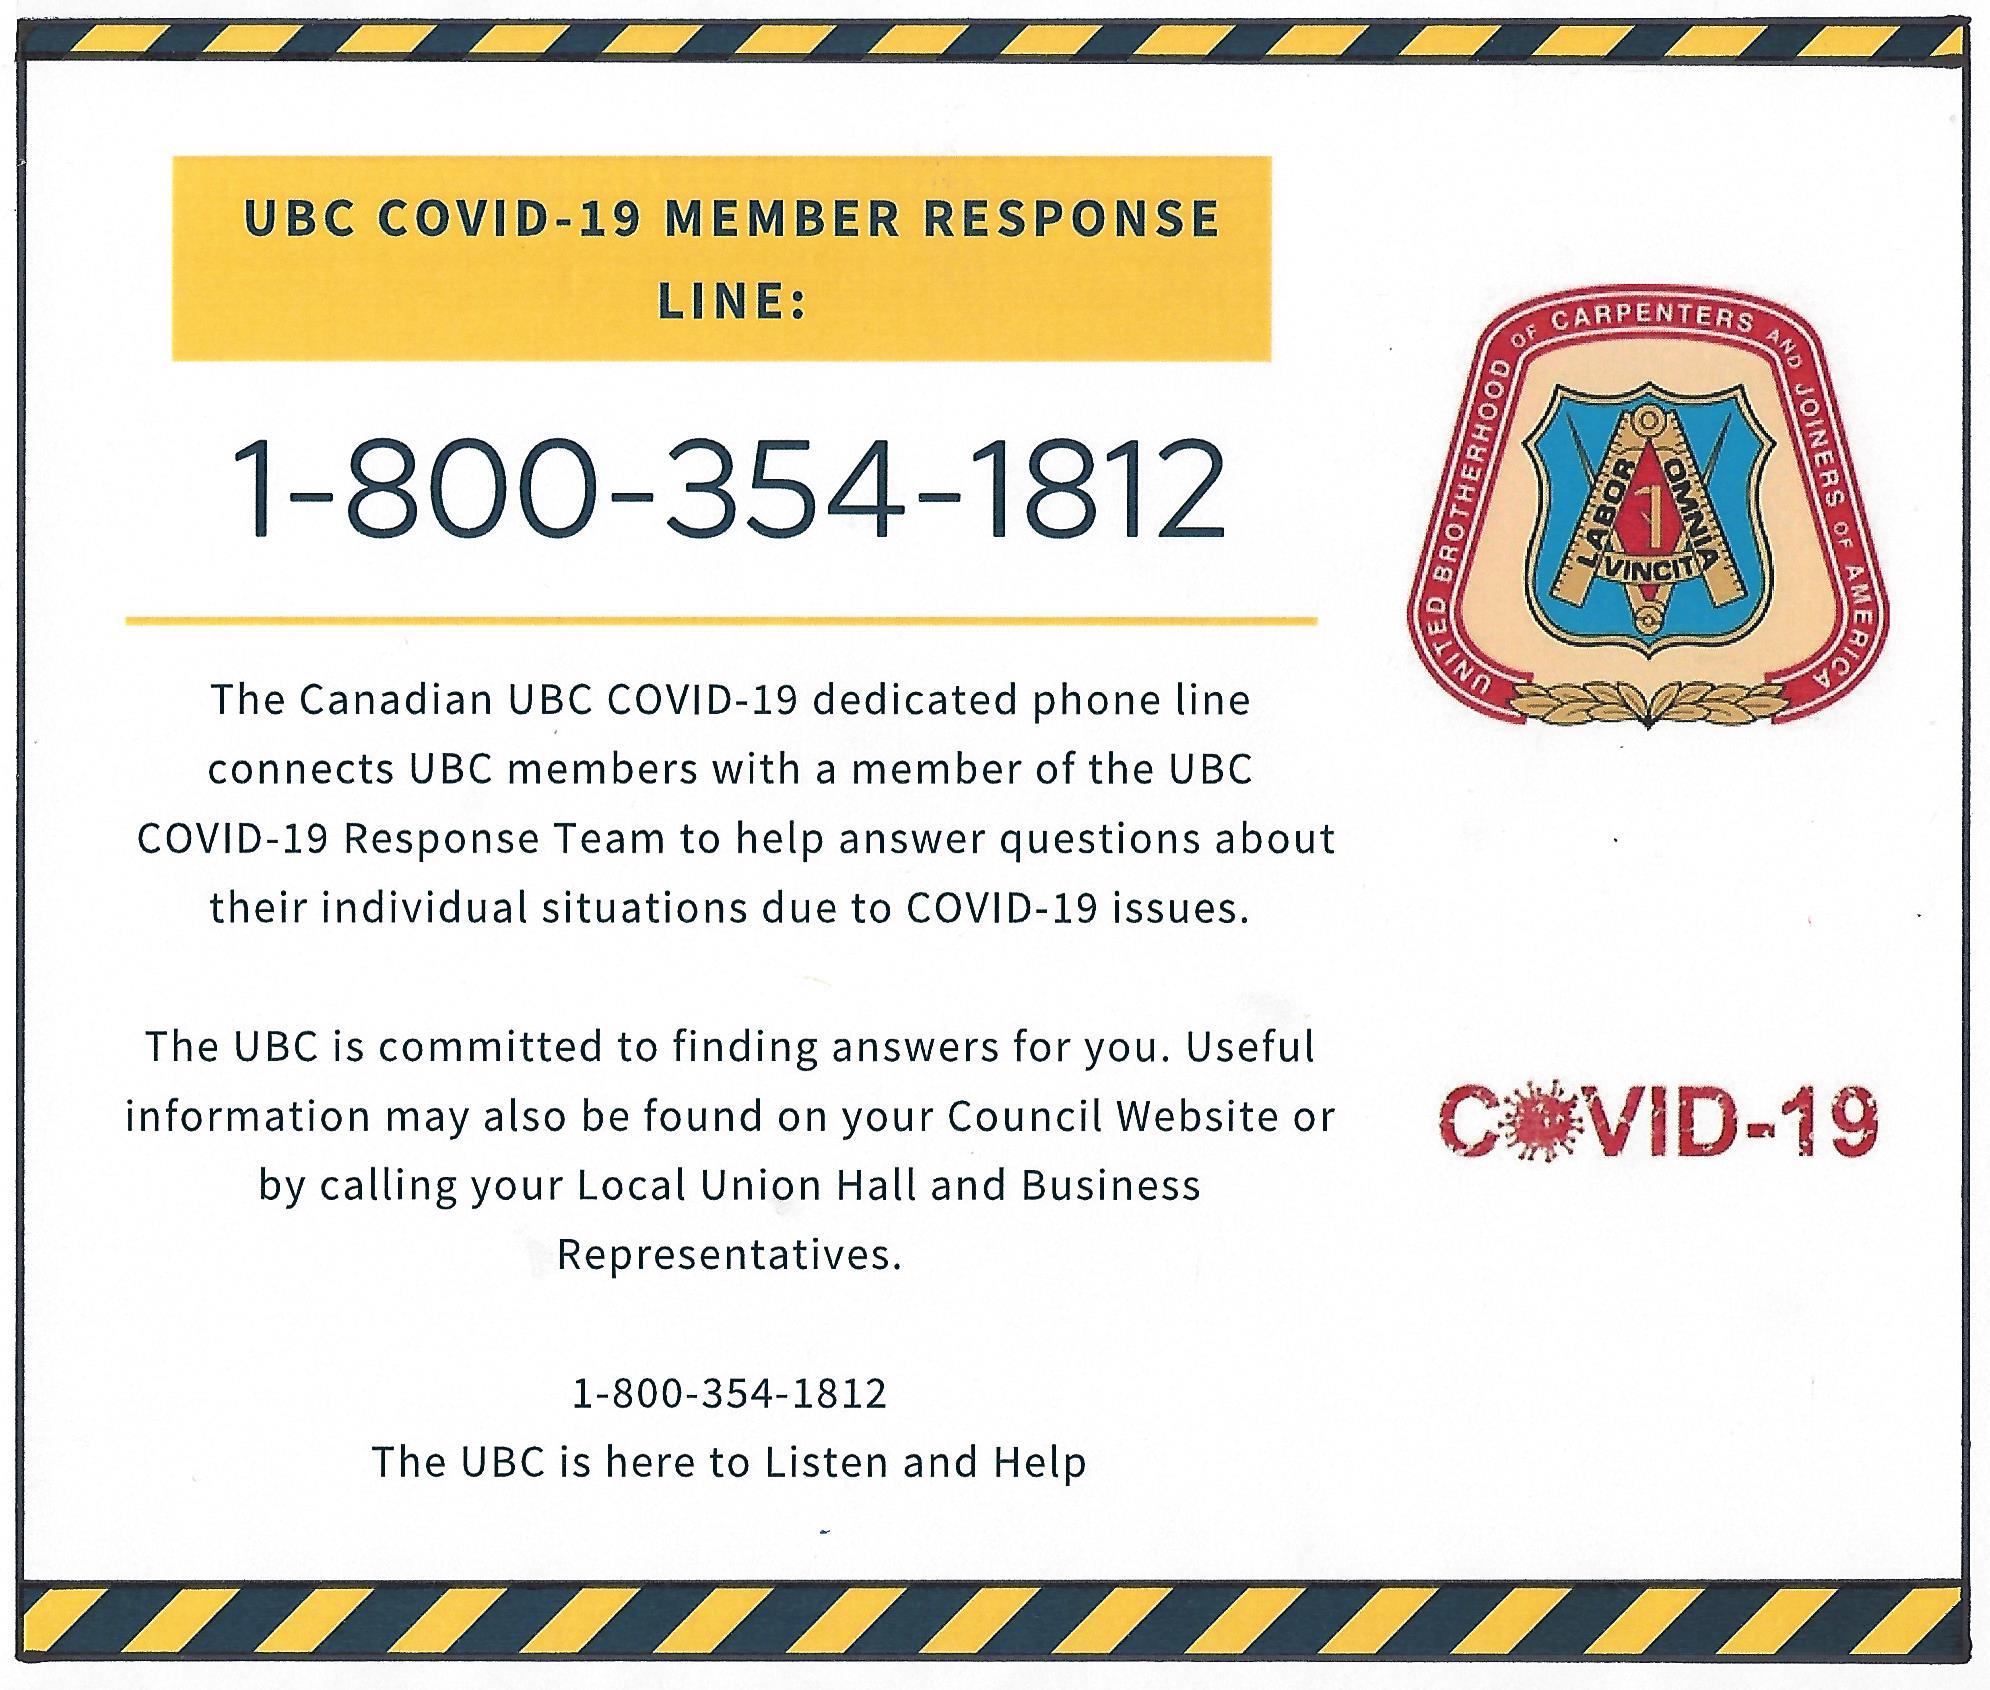 2020.04.07-UBC_COVID19_Member_Response_Line.jpg